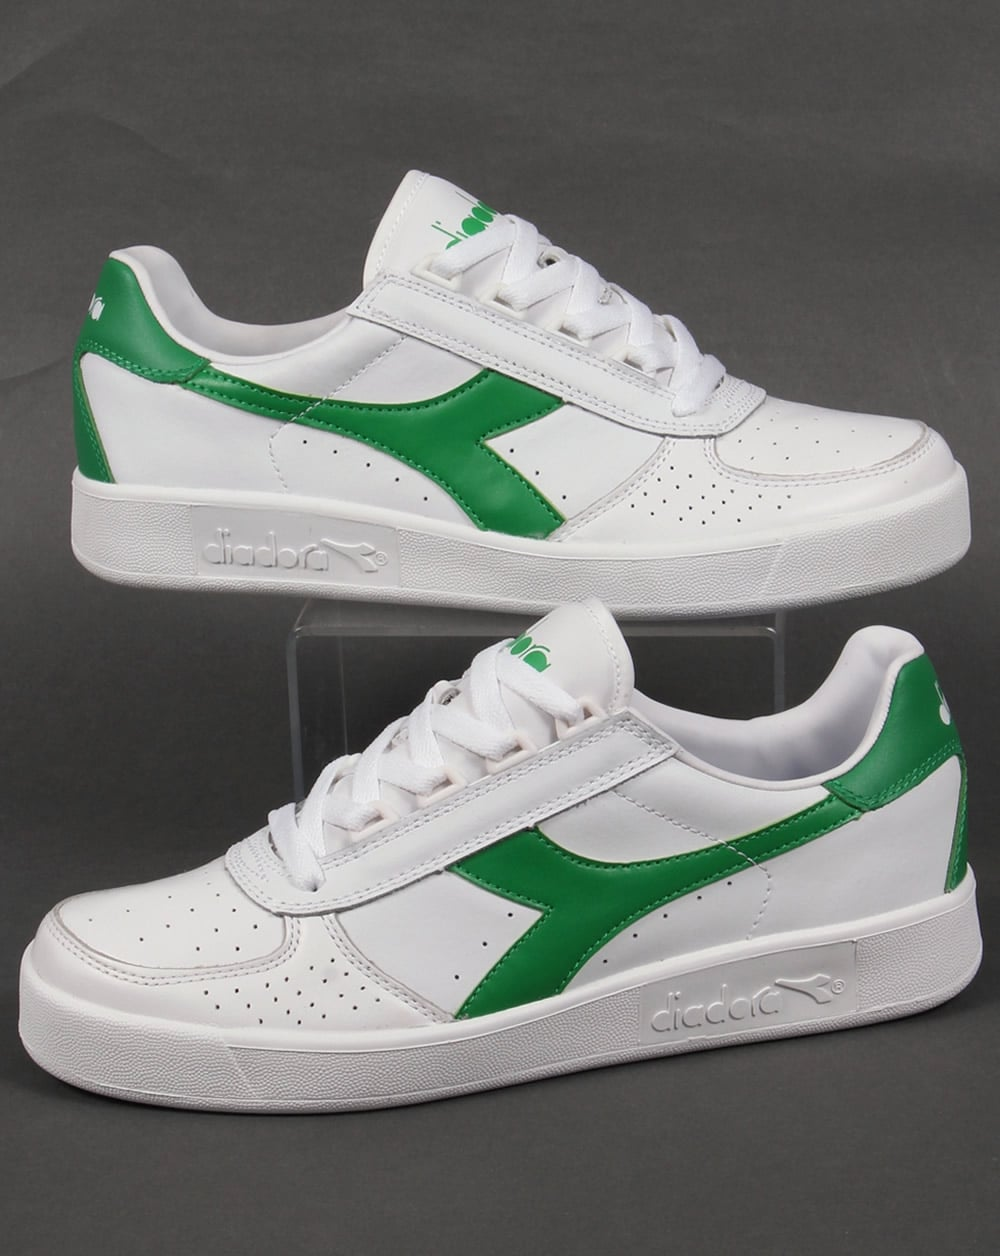 061f5992dc Diadora B. Elite Trainers White/Green